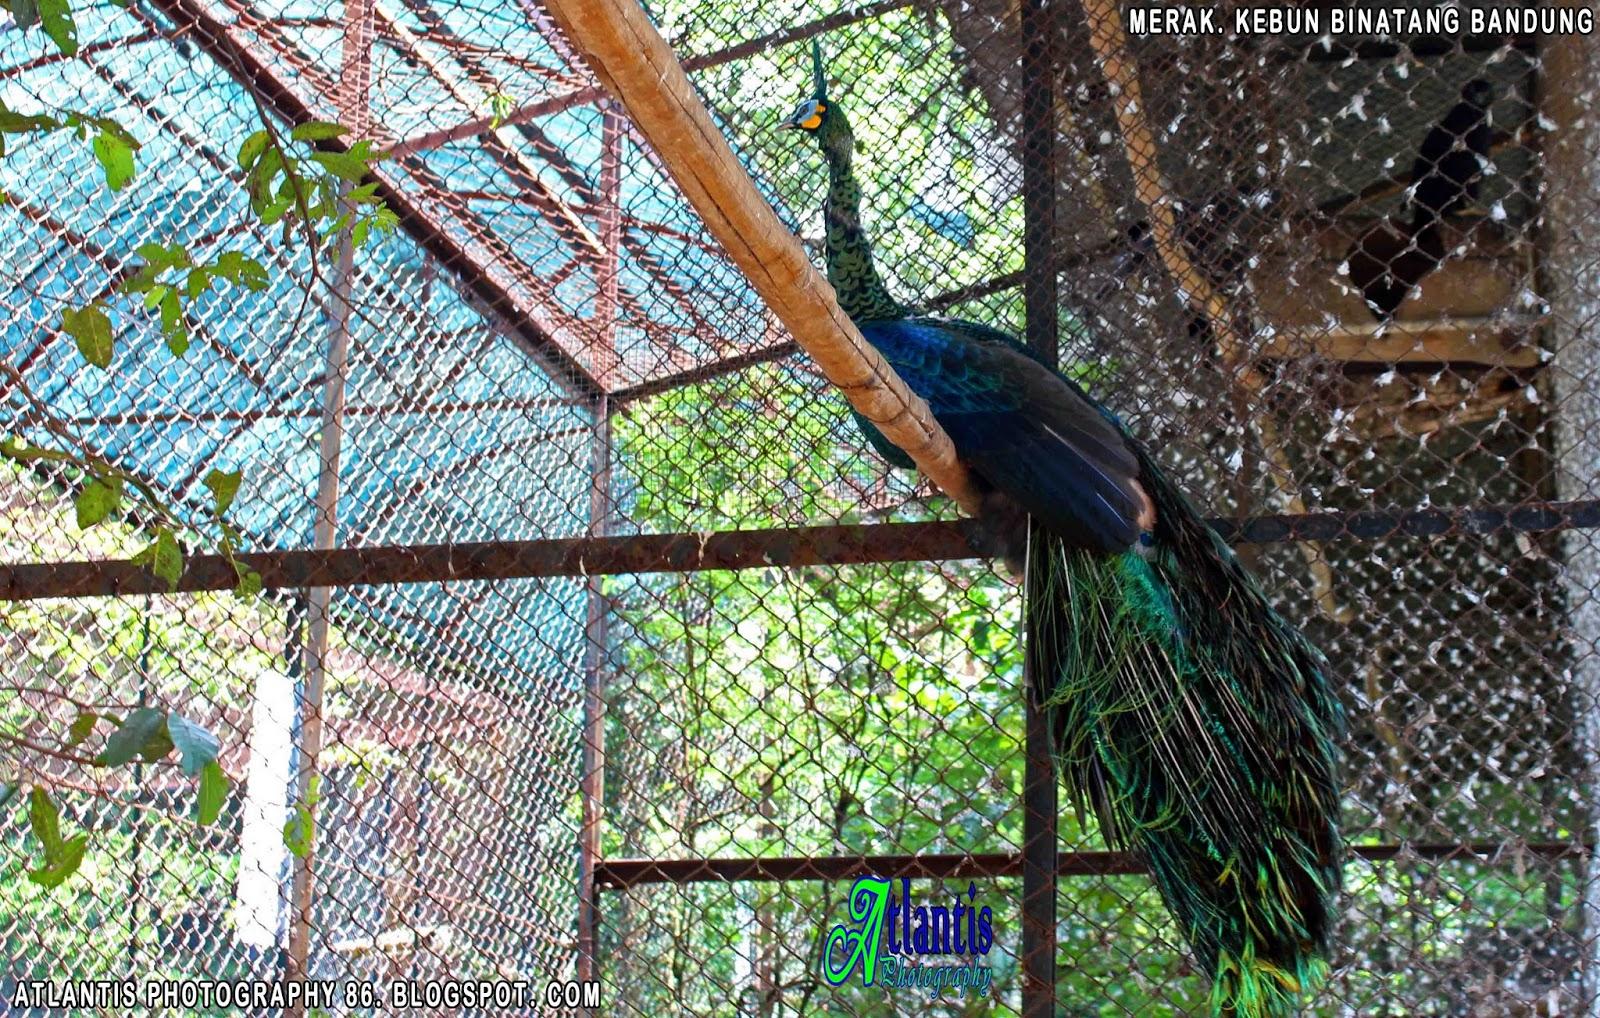 Atlantis Photography Krui Bandung Zoo Kebun Binatang Rangkong Ciri Khasnya